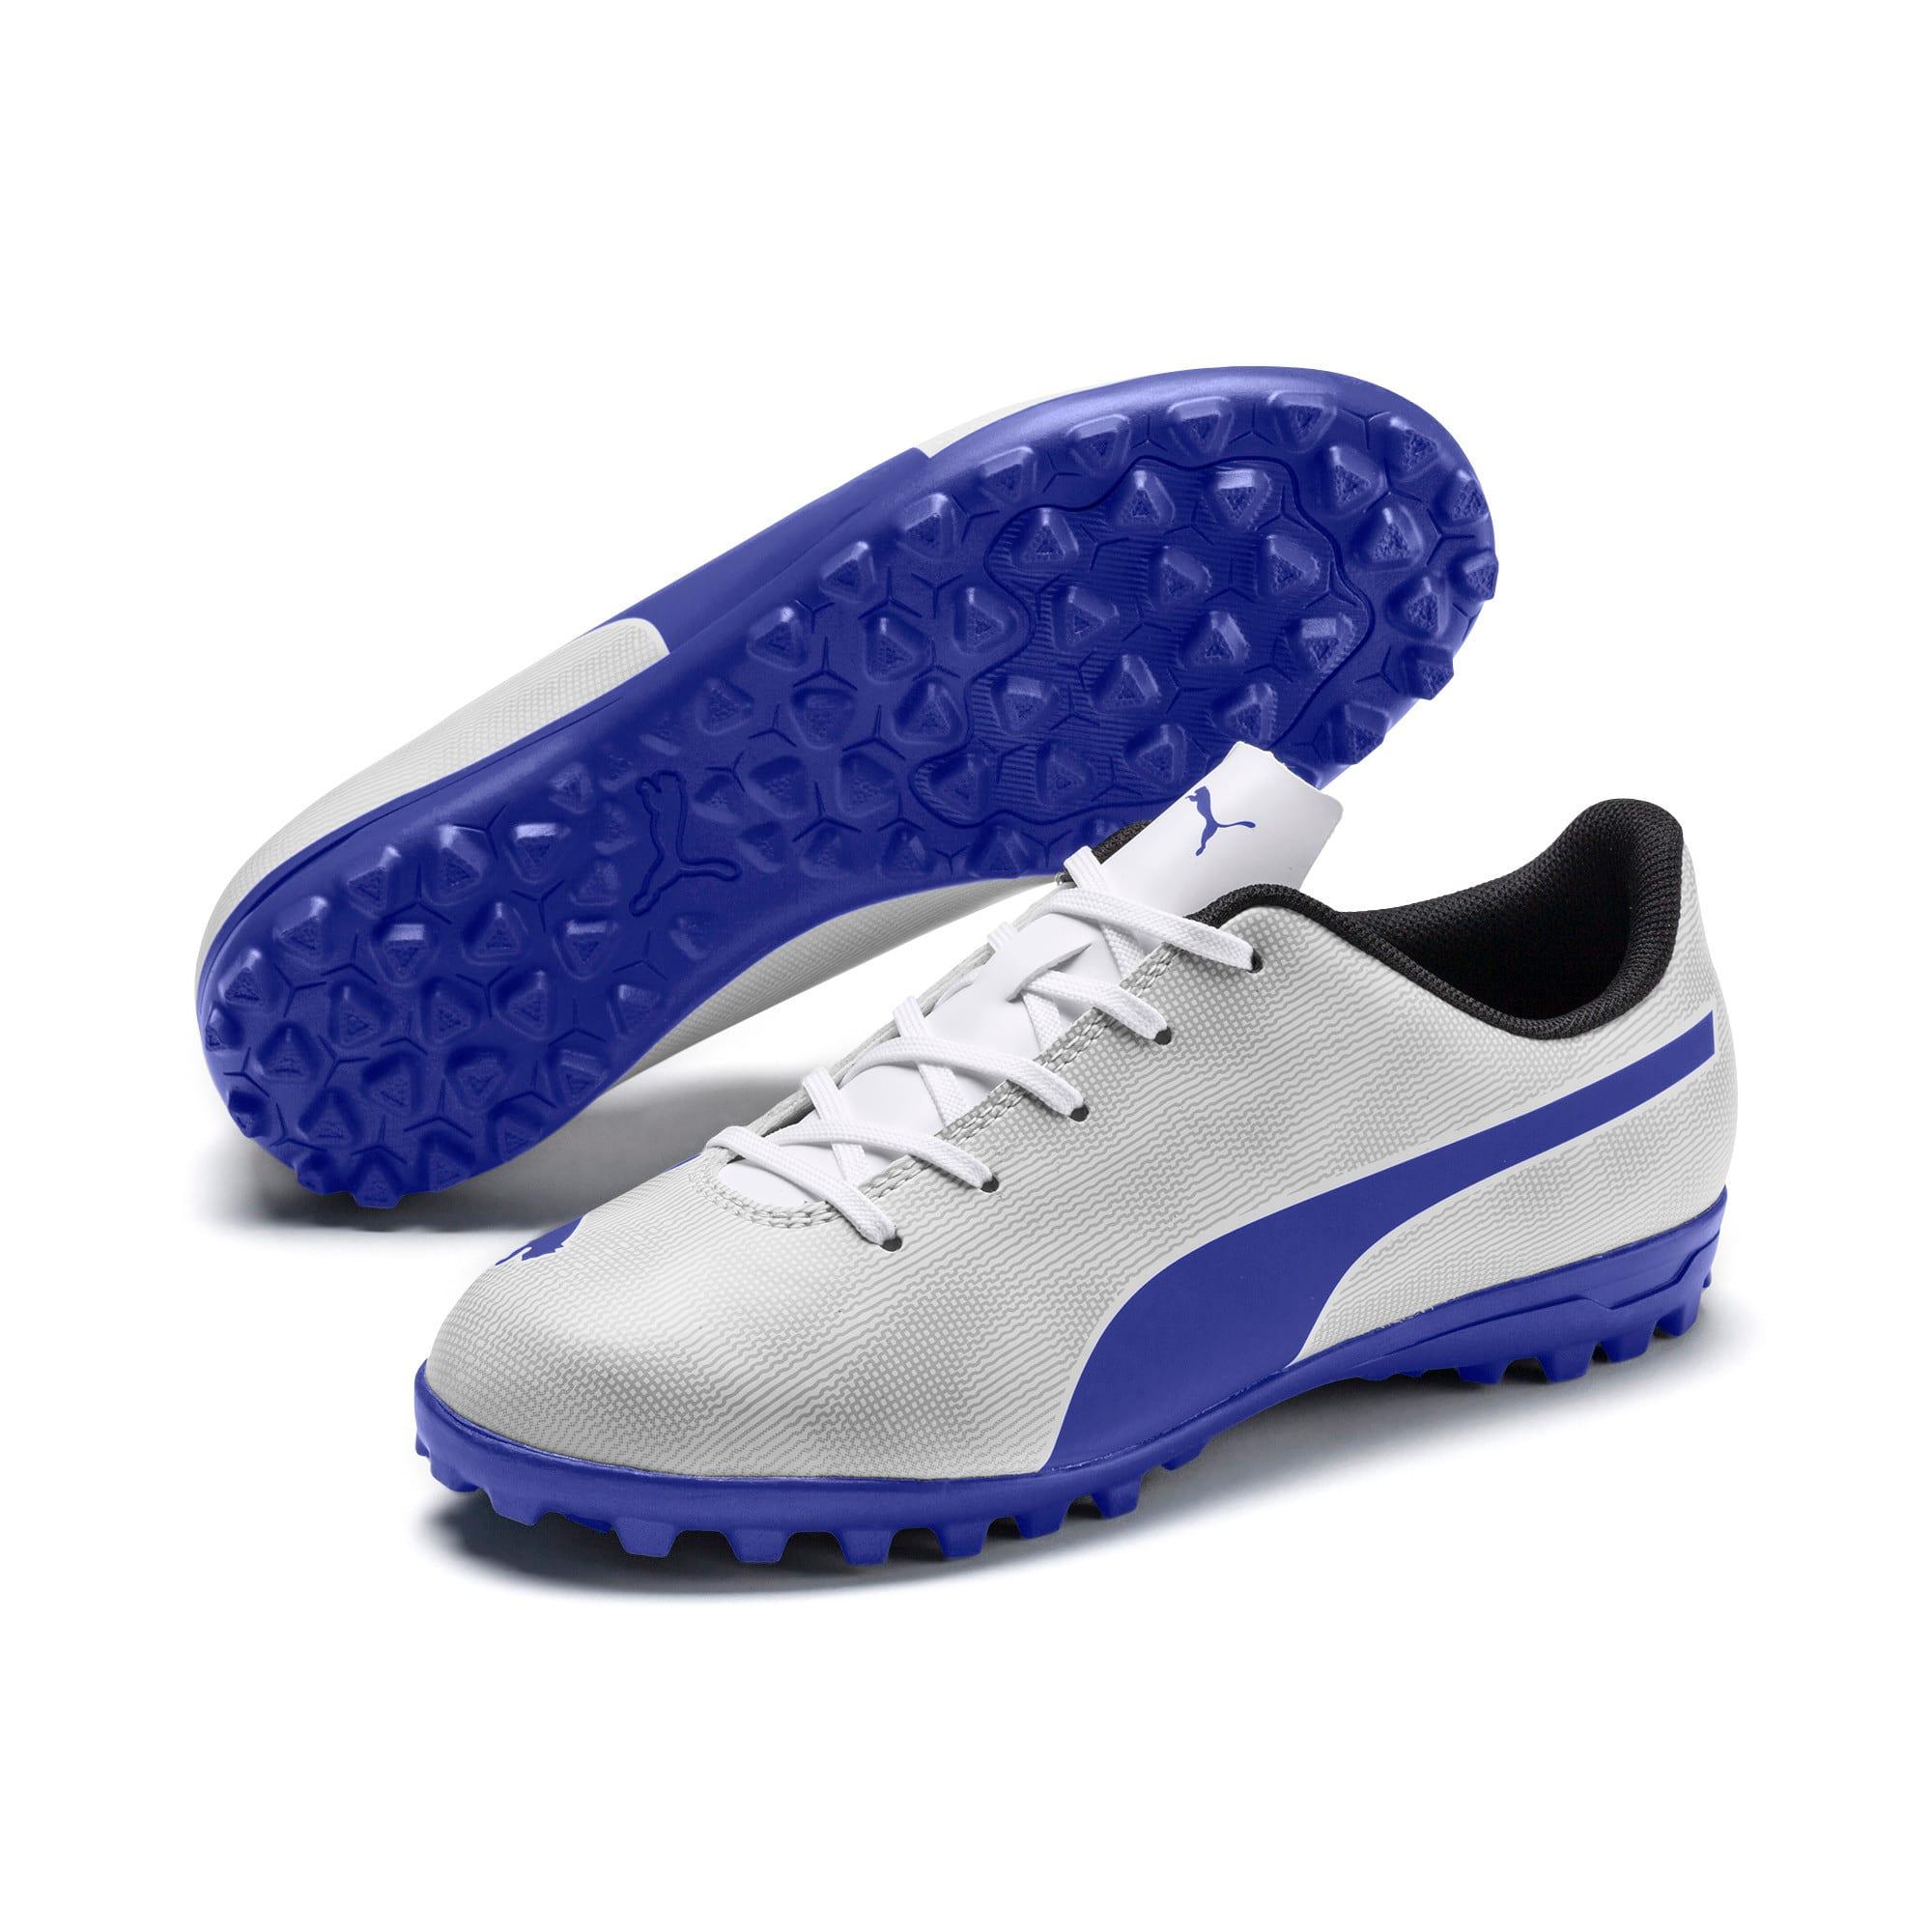 Thumbnail 2 of Rapido TT Boy's Soccer Cleats JR, White-Royal Blue-Light Gray, medium